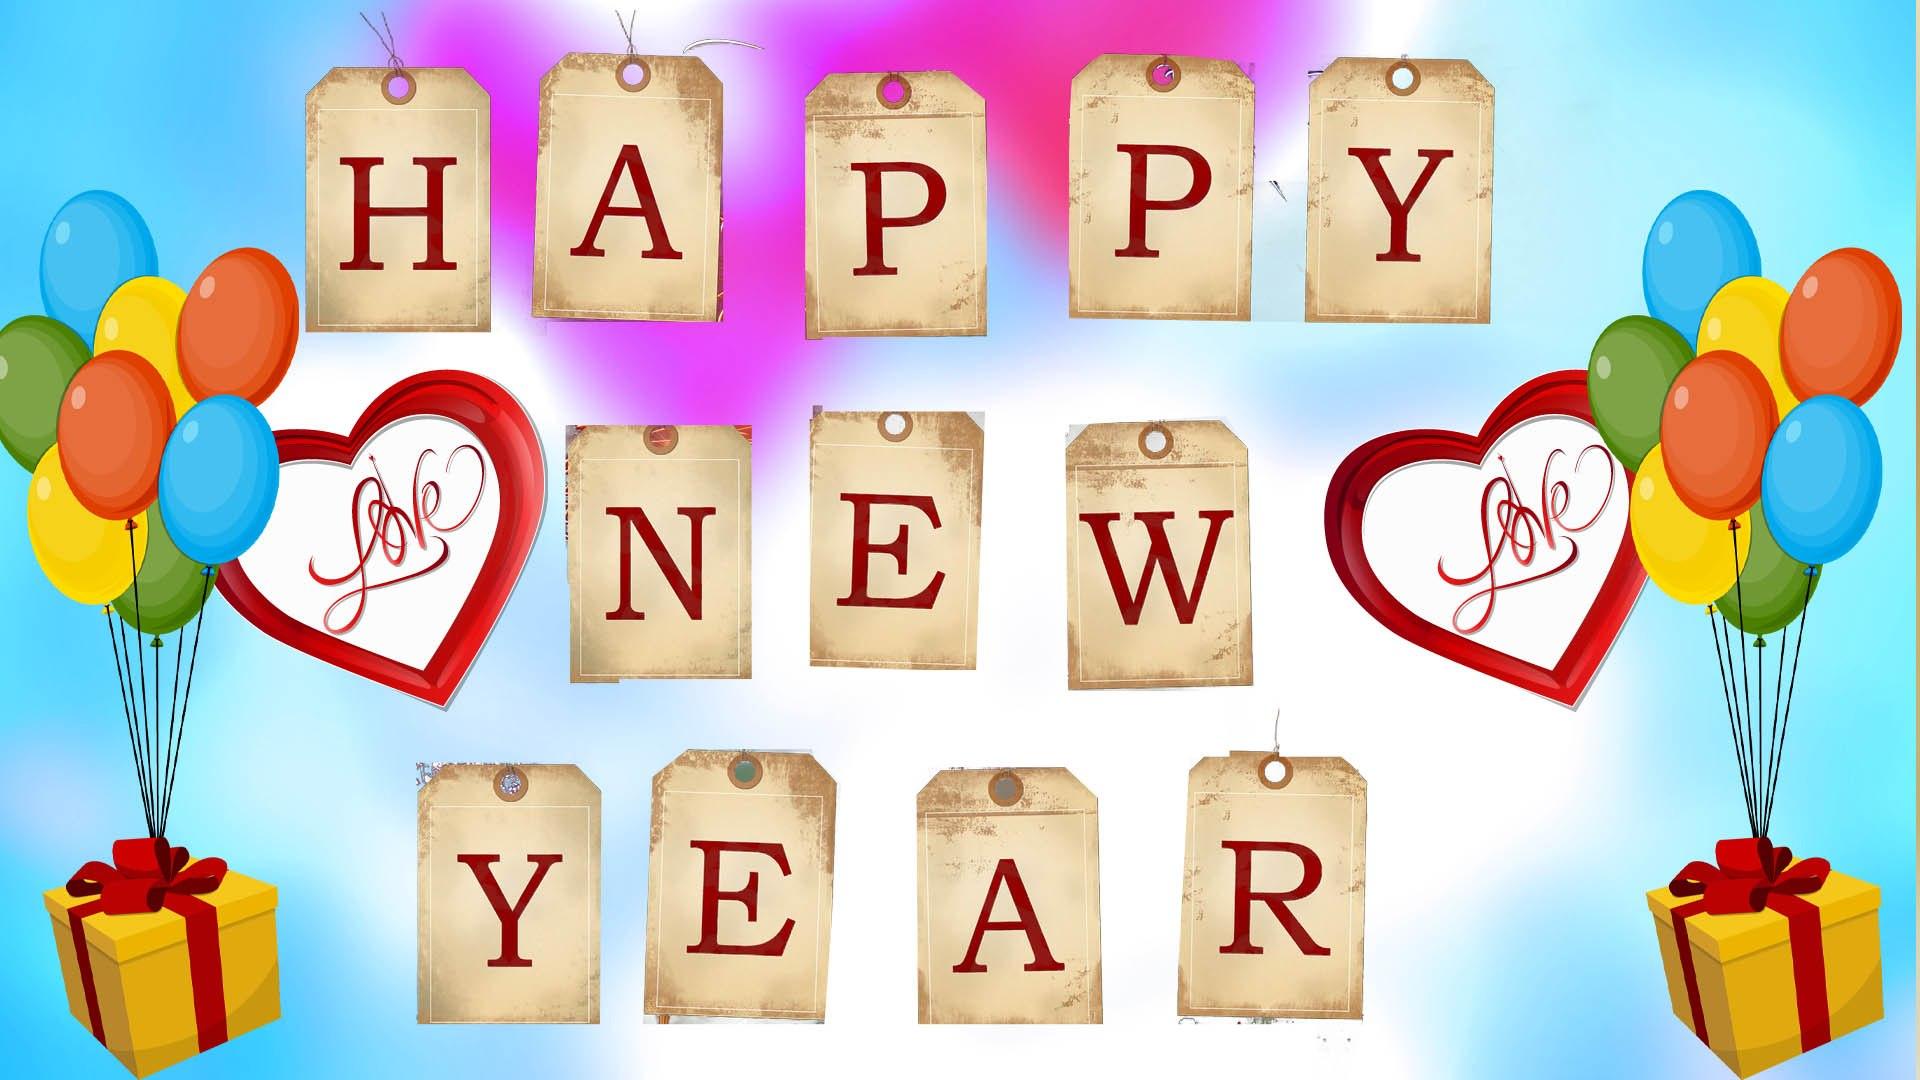 Happy New Year 2021 - #2021 नए साल की शायरी - Happy New Year 2021 Shayari - New Year Wishes 2021 - N